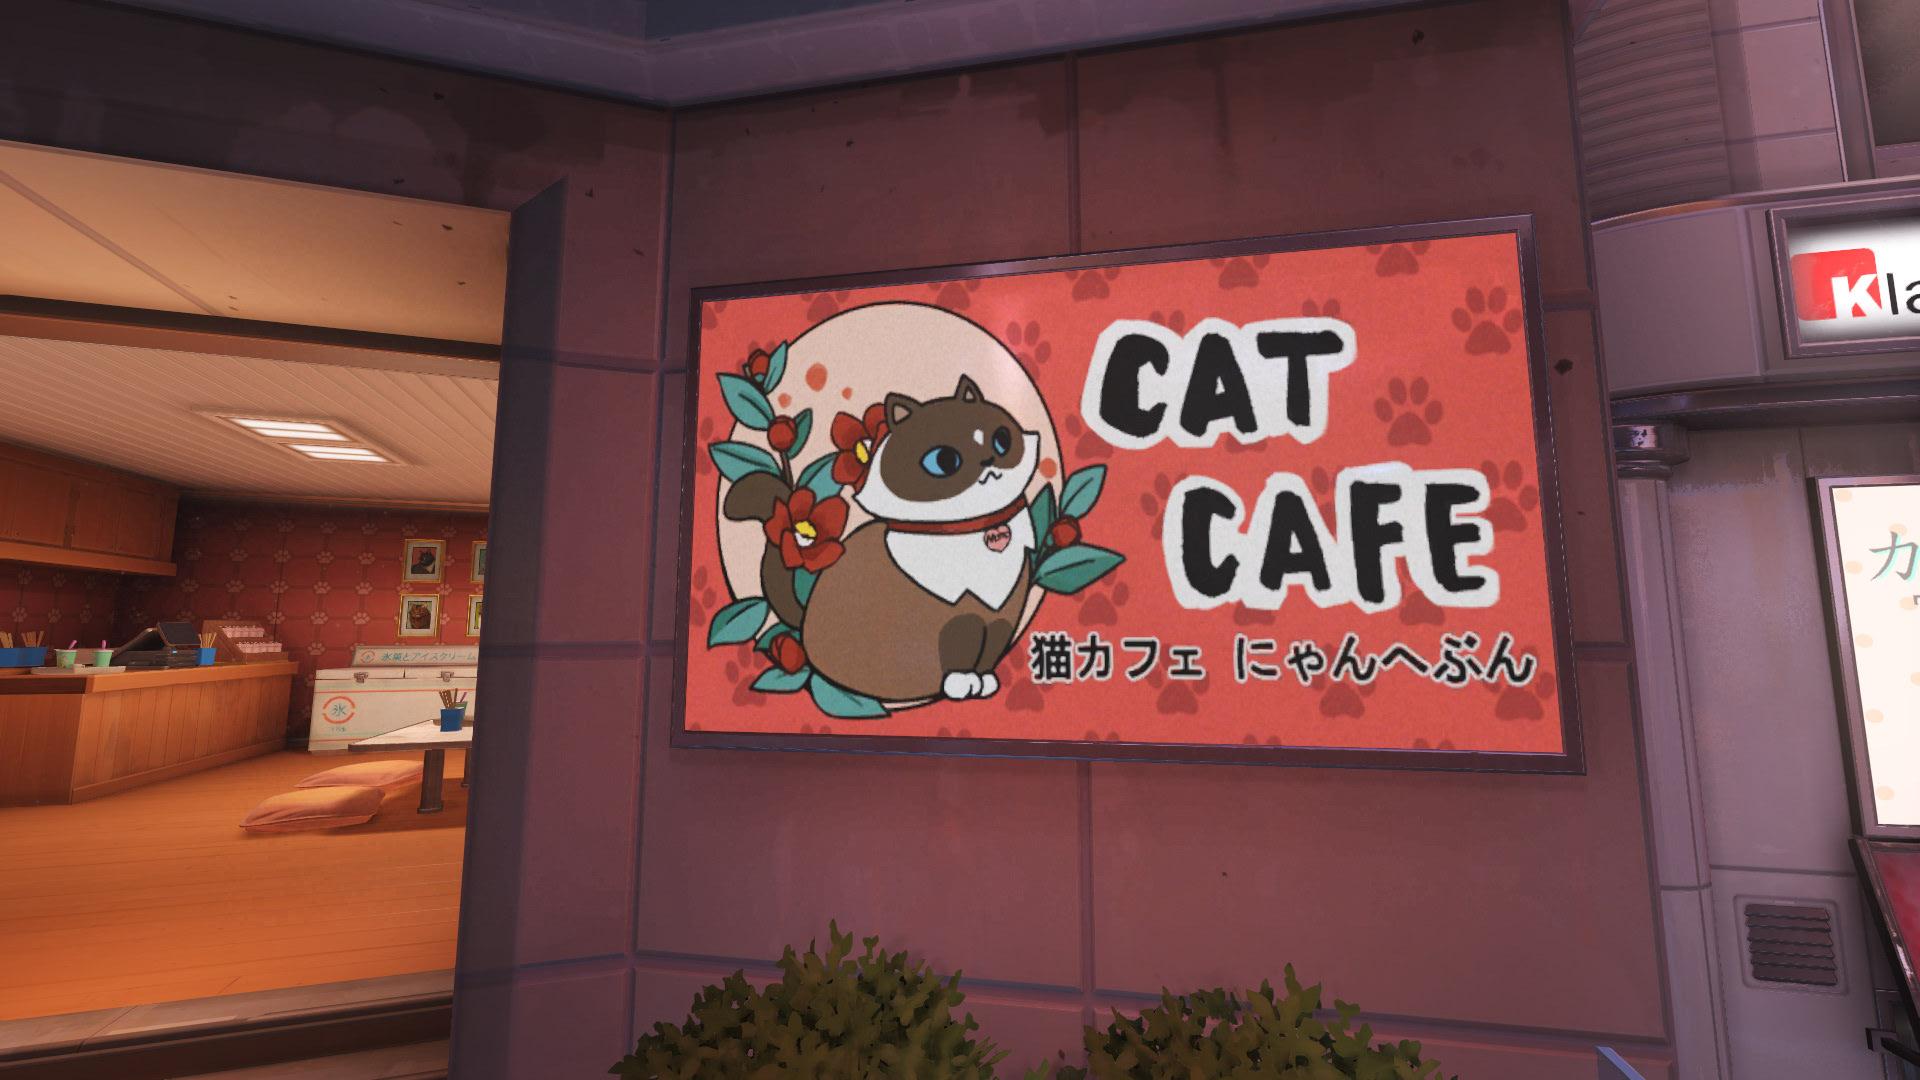 Kanezaka Cat Cafe Overwatch